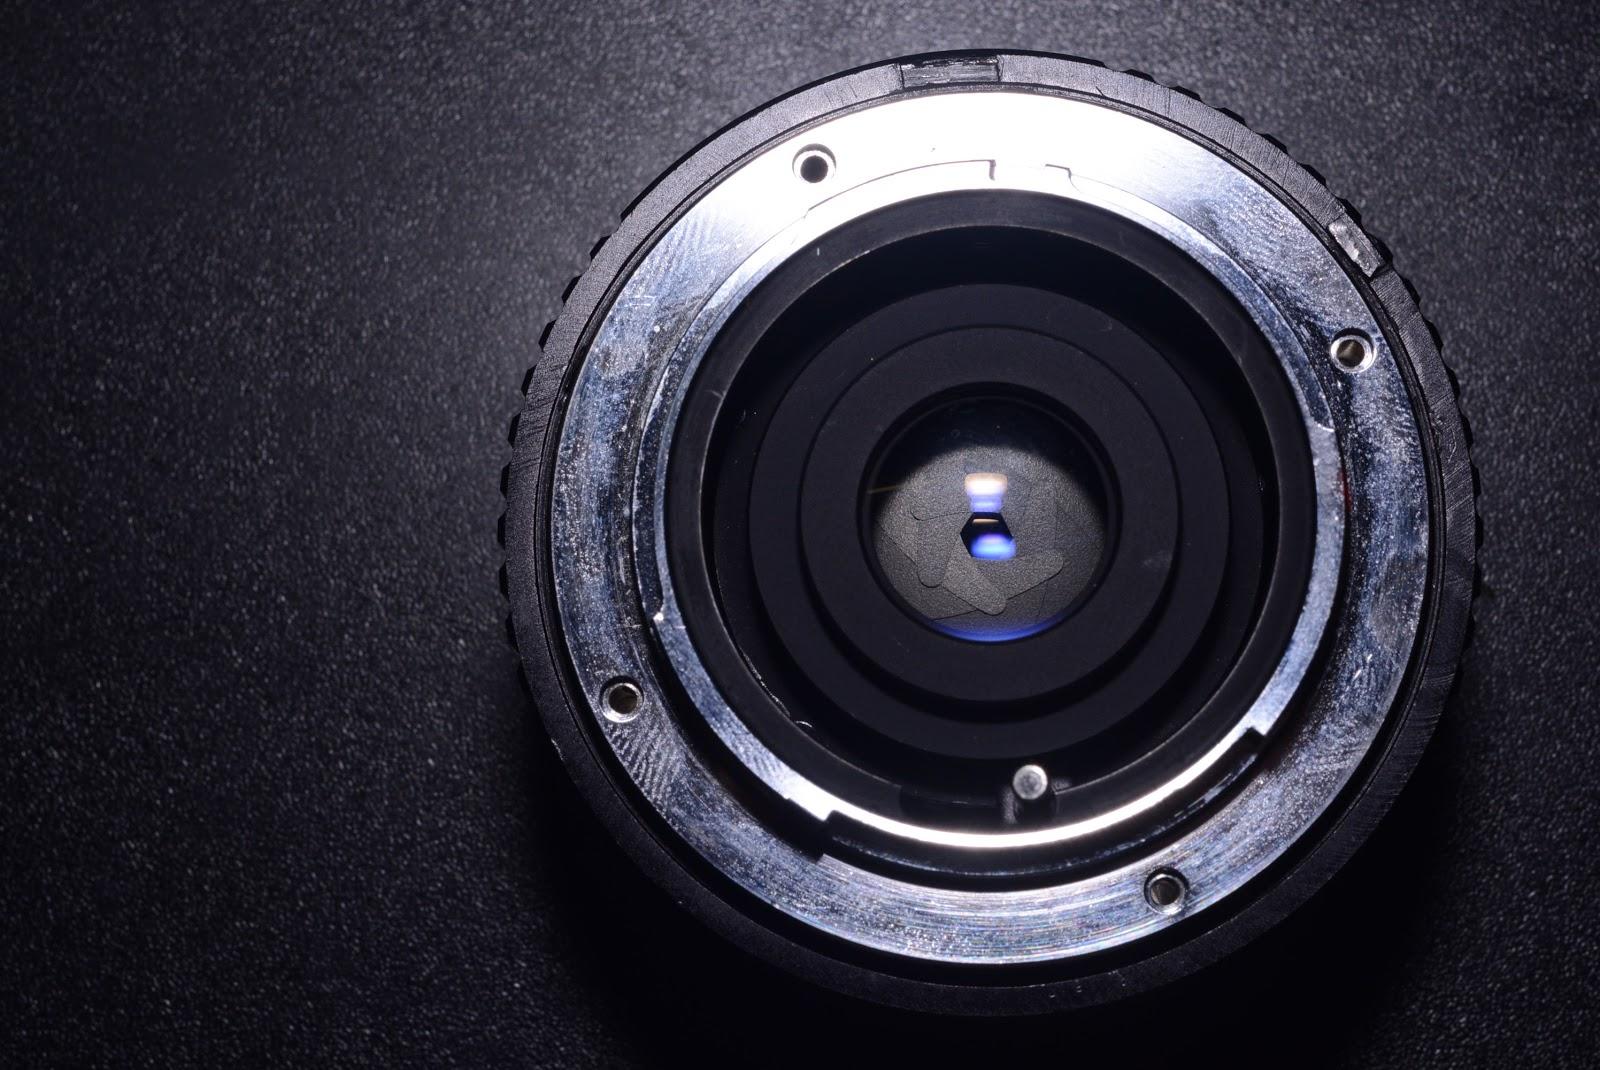 Alfo Supercolor 28mm f/28 By Samyang (Minolta SR to Nikon F Conversion)